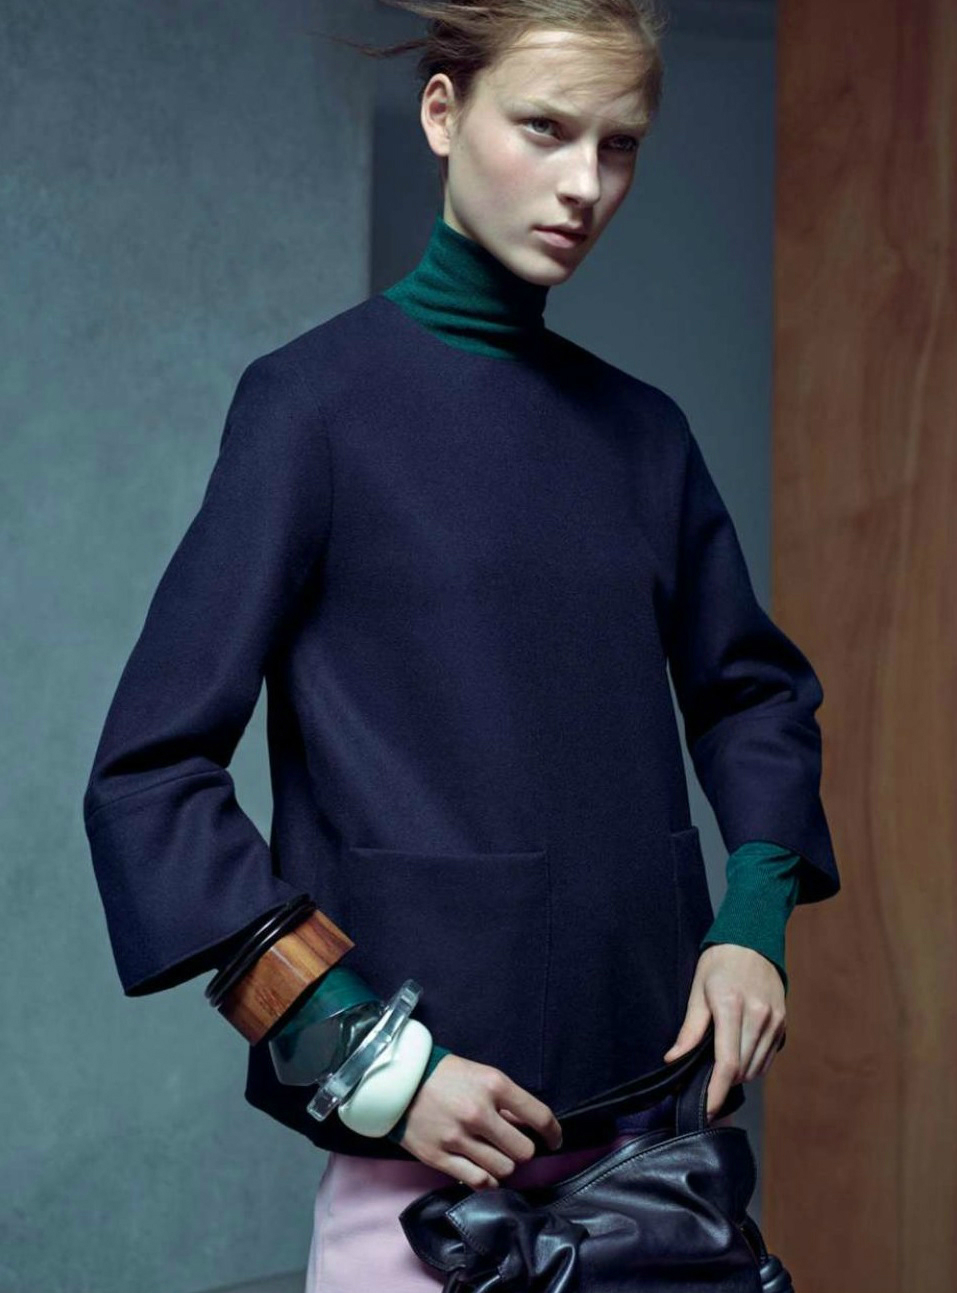 Karim-Sadli-Julia-Bergshoeff-Vogue-UK-January-2015-5.jpg